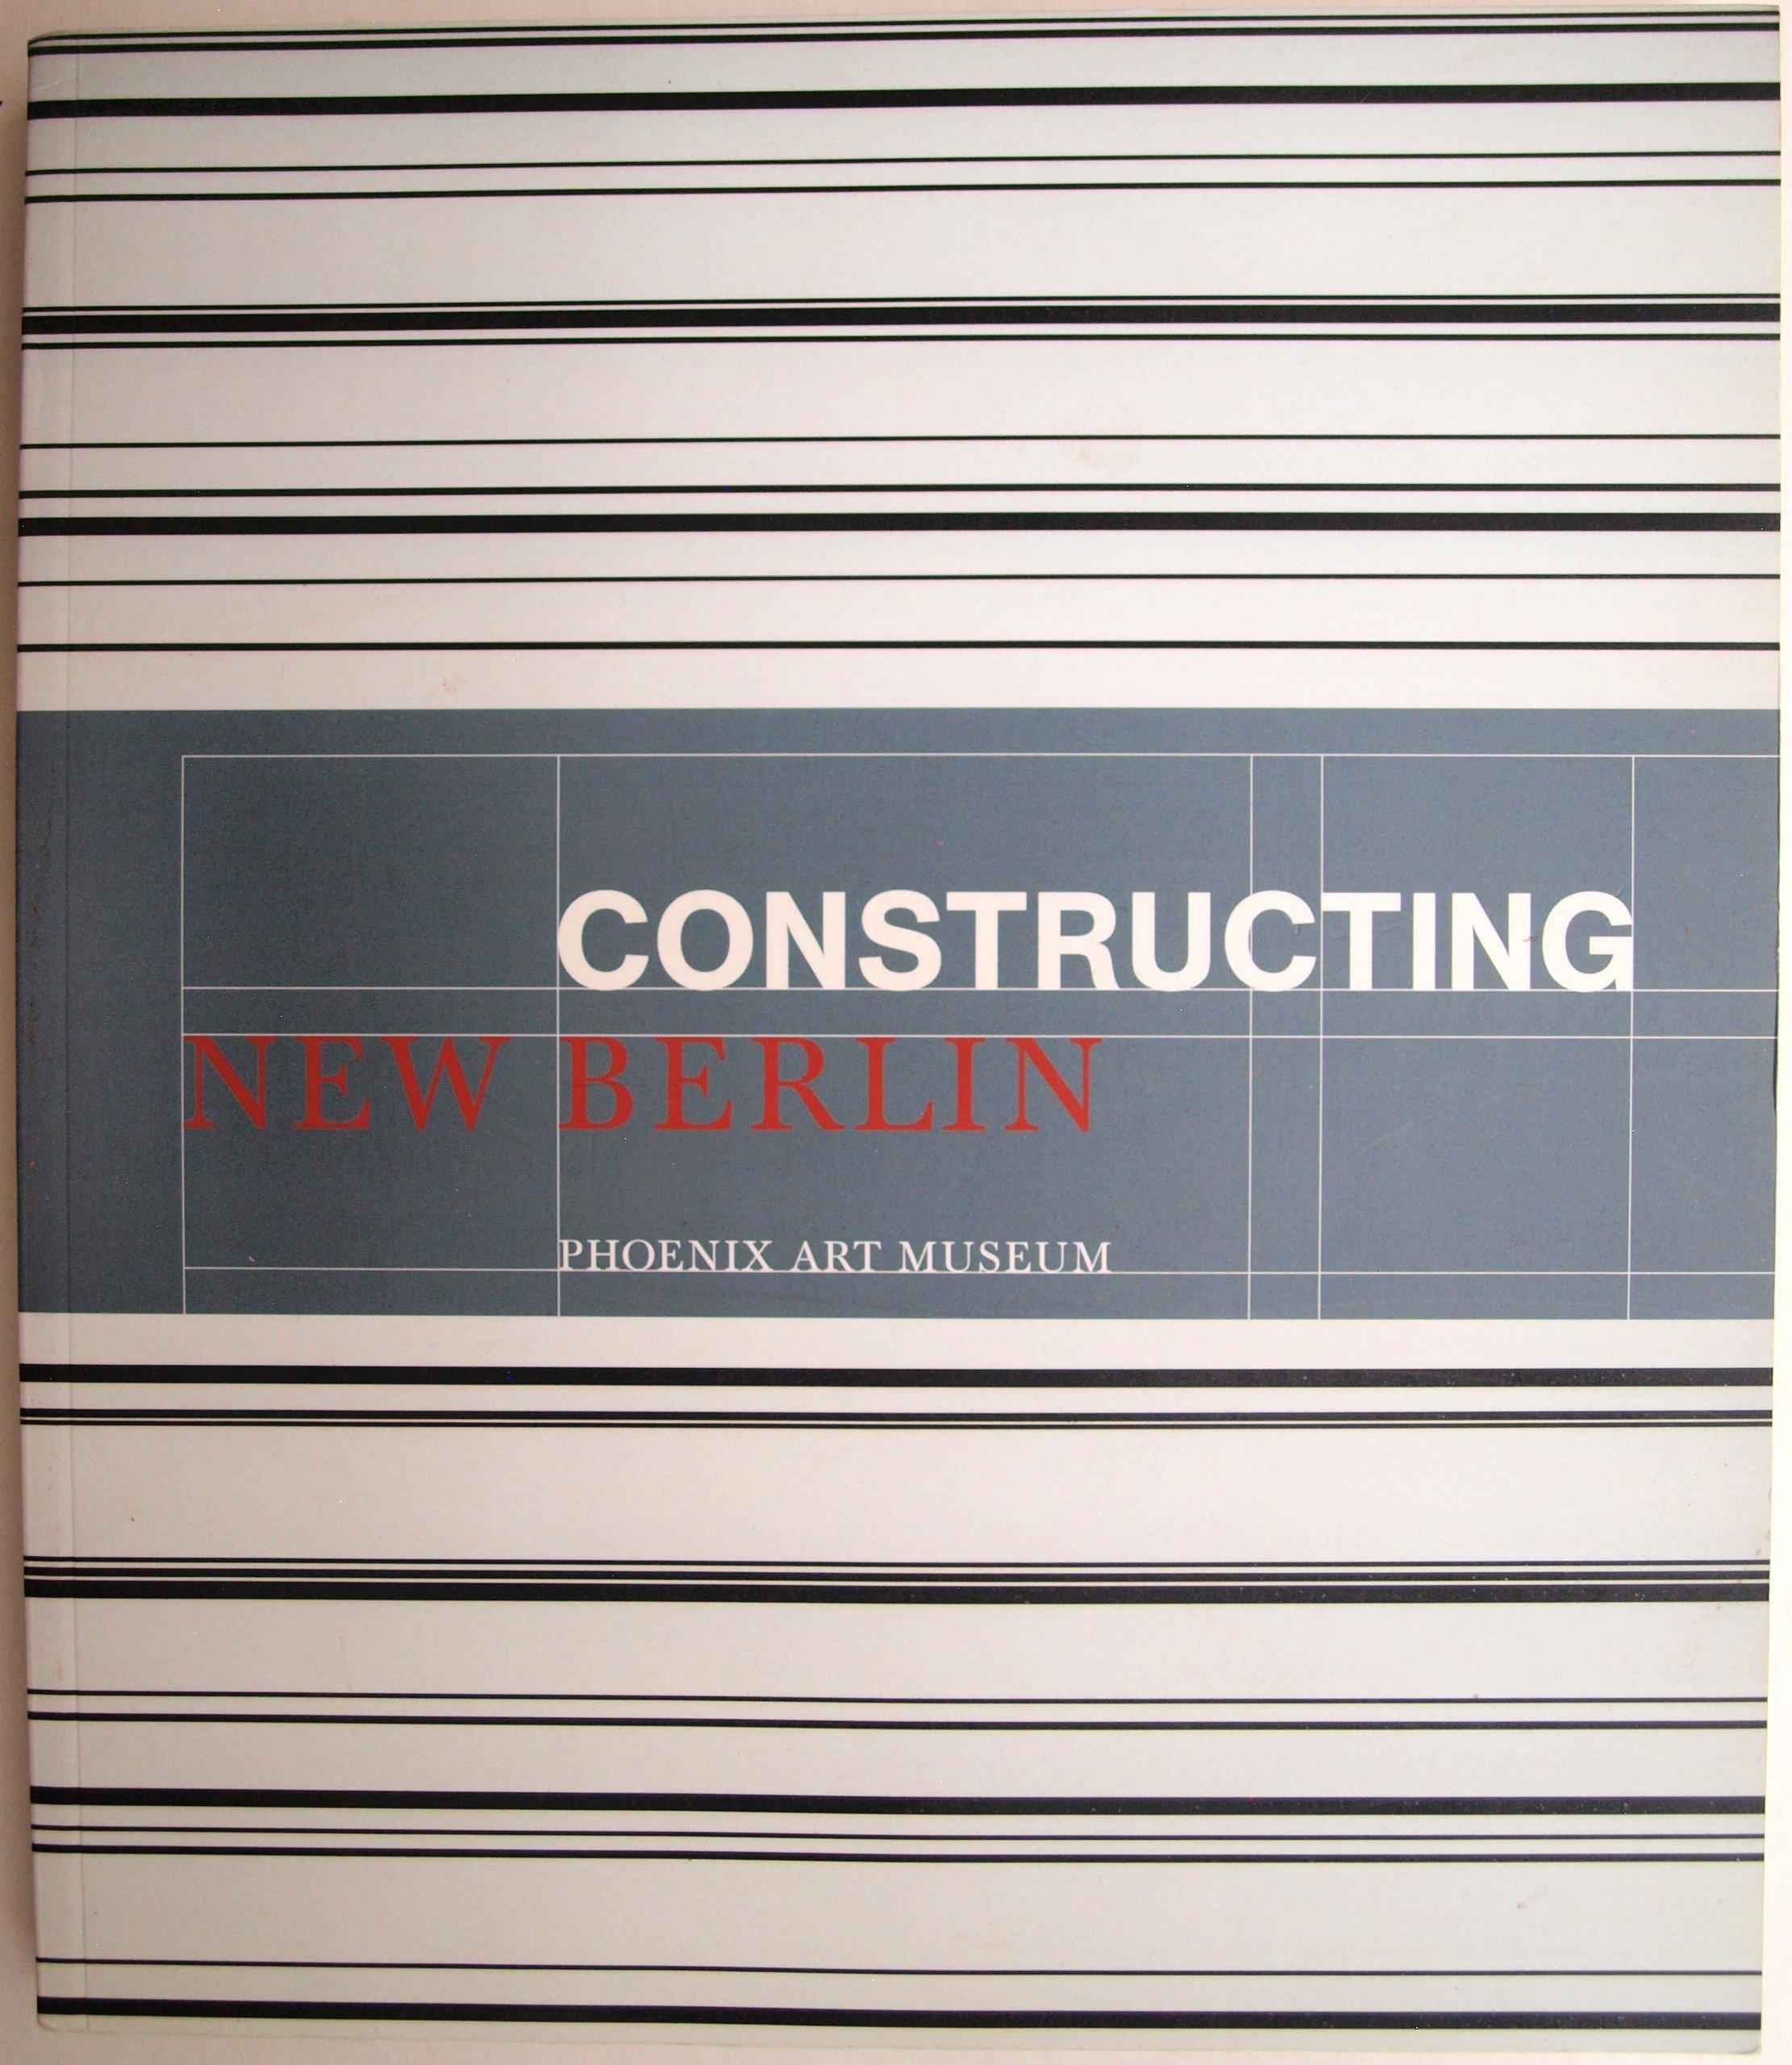 Download Constructing New Berlin: Contemporary Art Made in Berlin ebook